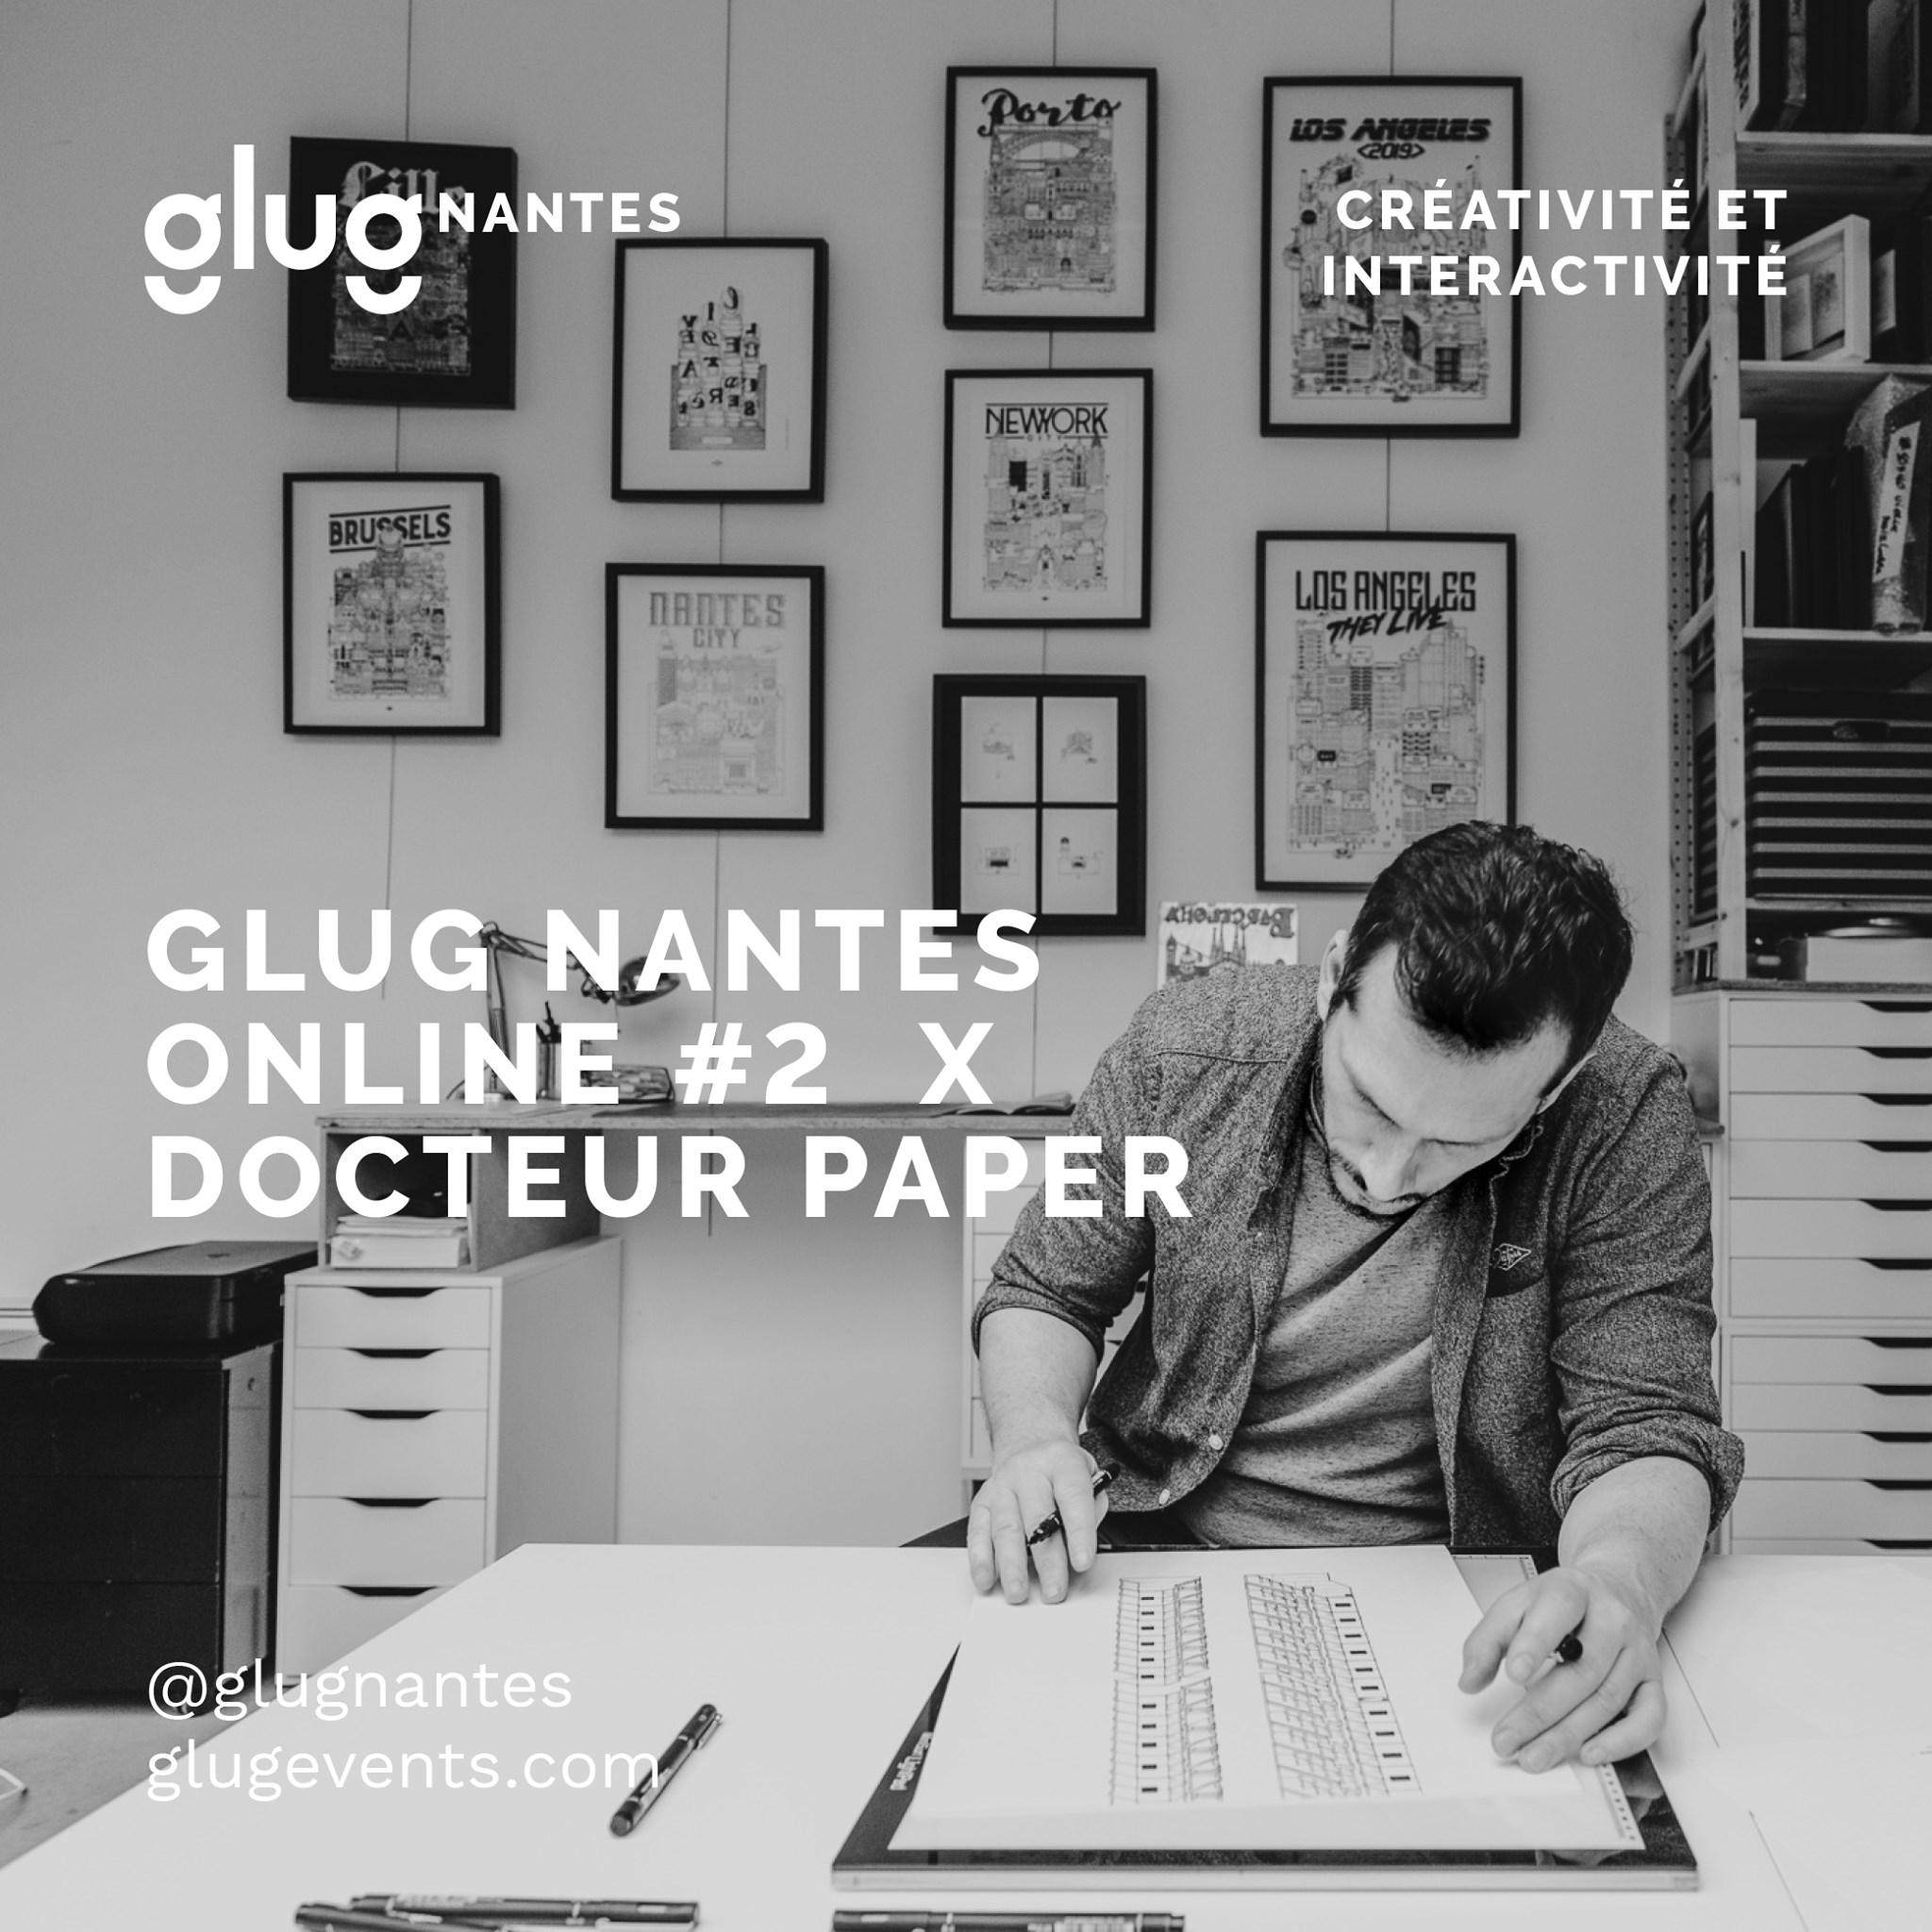 glug nantes Docteur Paper